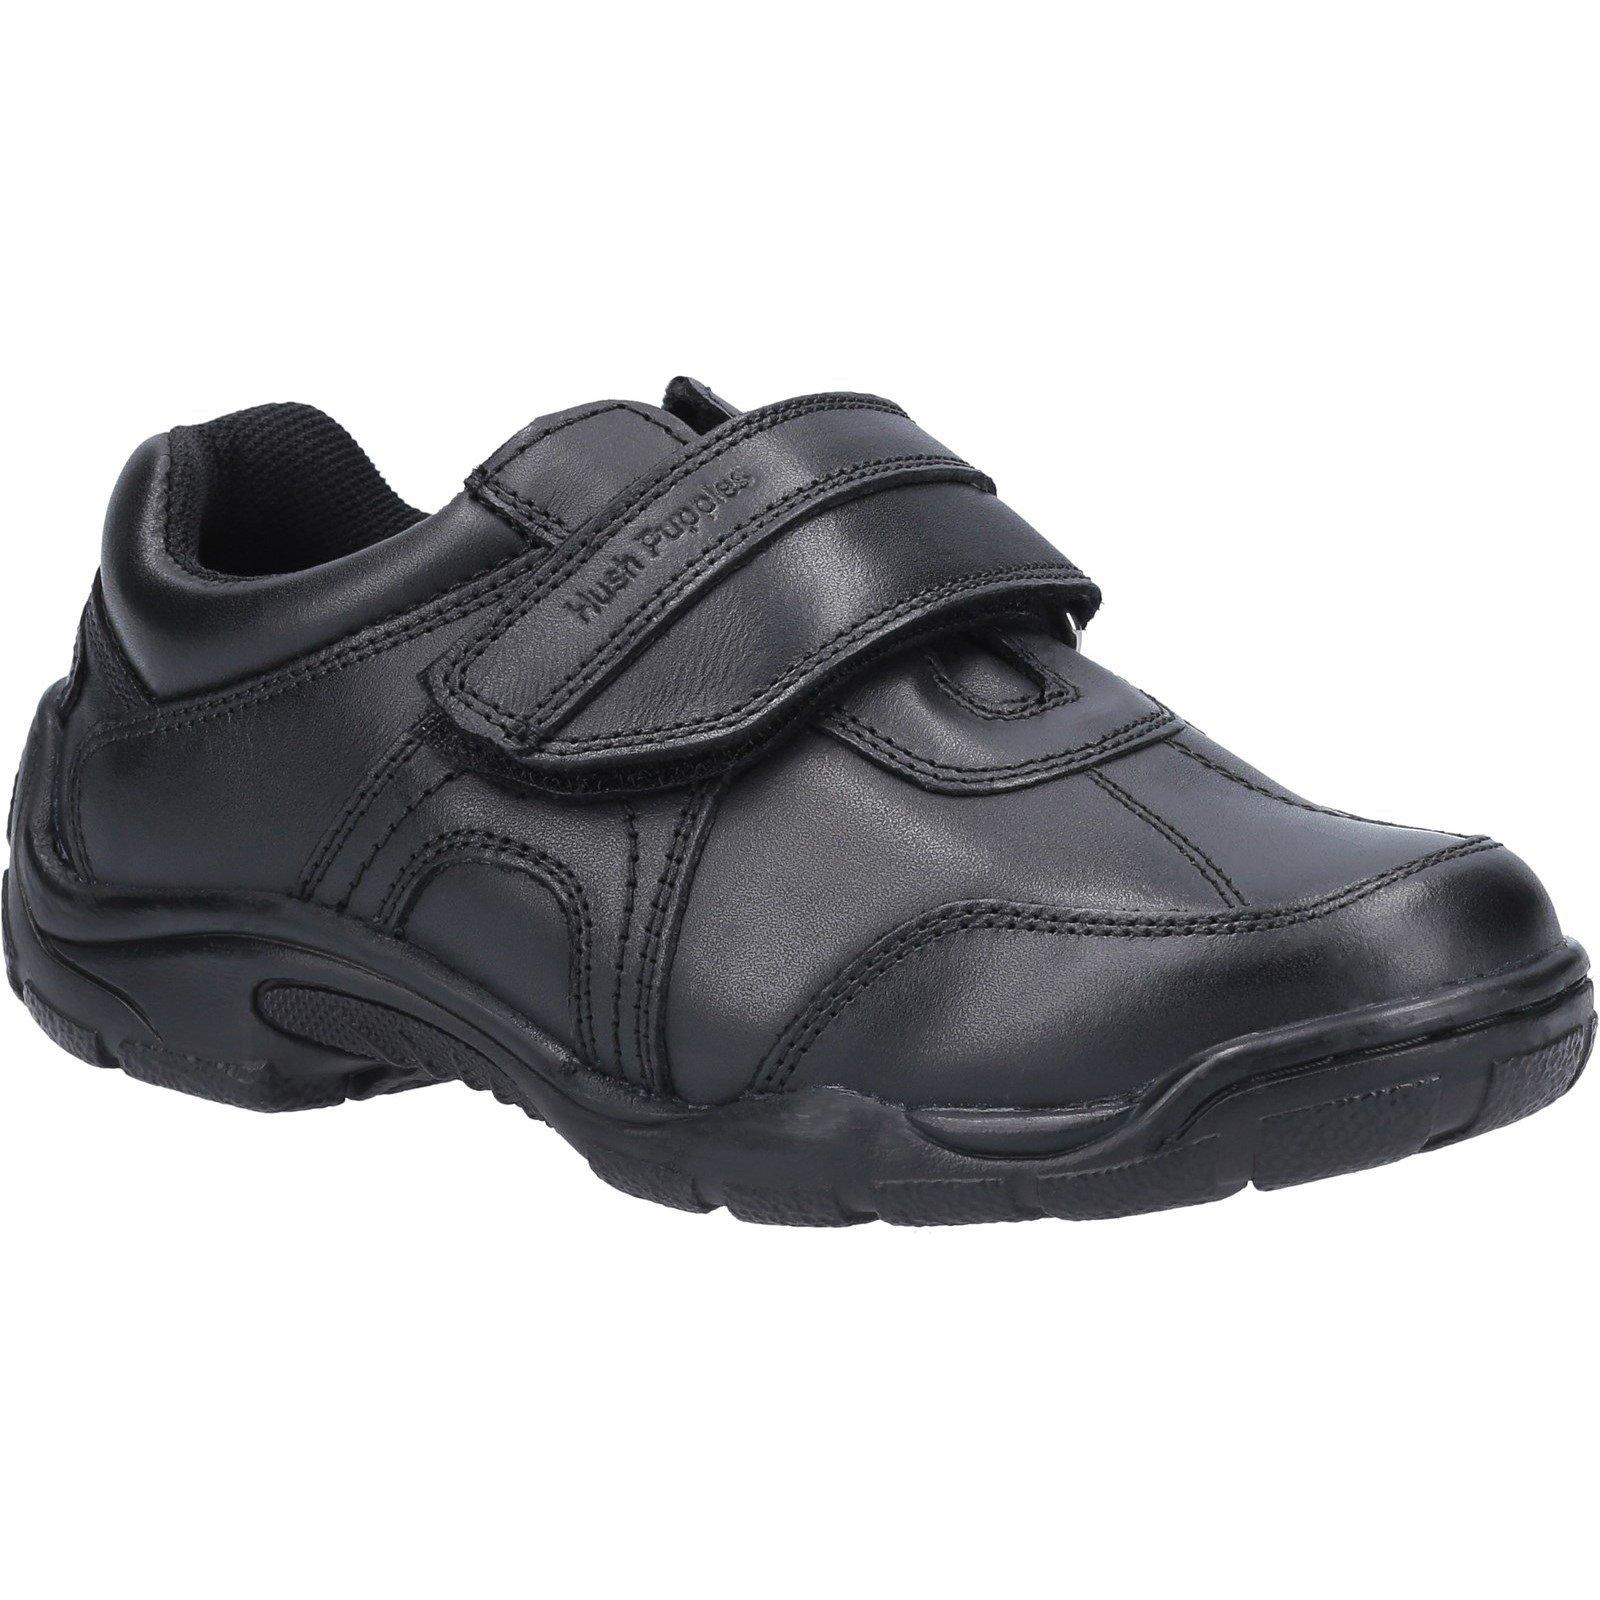 Hush Puppies Kid's Arlo Junior School Shoe Black 30853 - Black 12